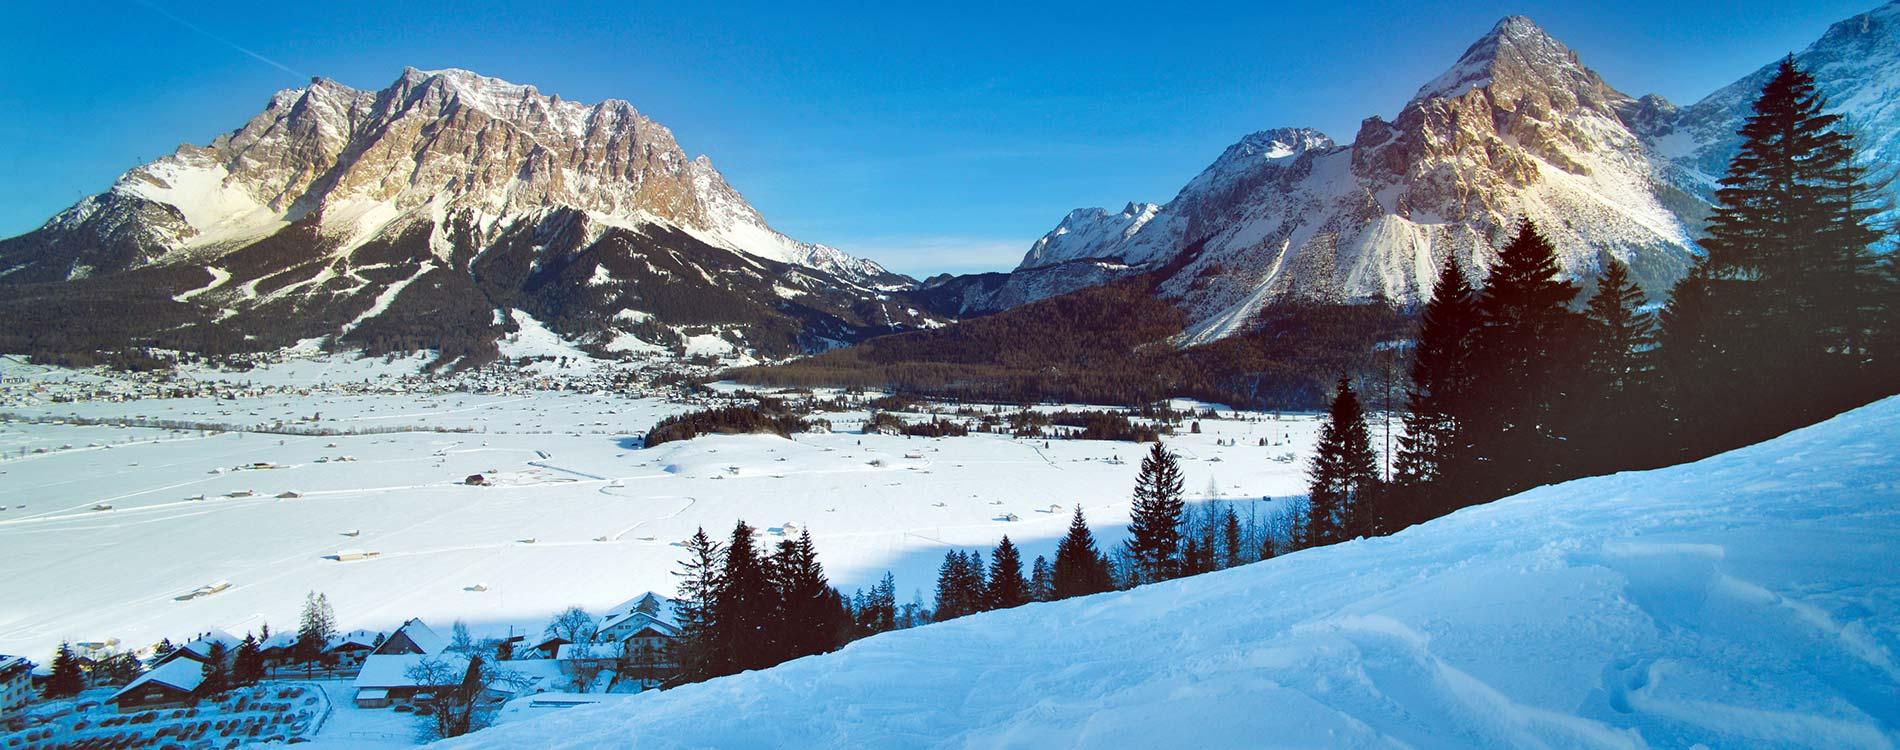 apres-ski Schlager Open Air Family Hotel Tirolerhof Ehrwald Zugspitzarena Tyrol Austria Ski Holidays